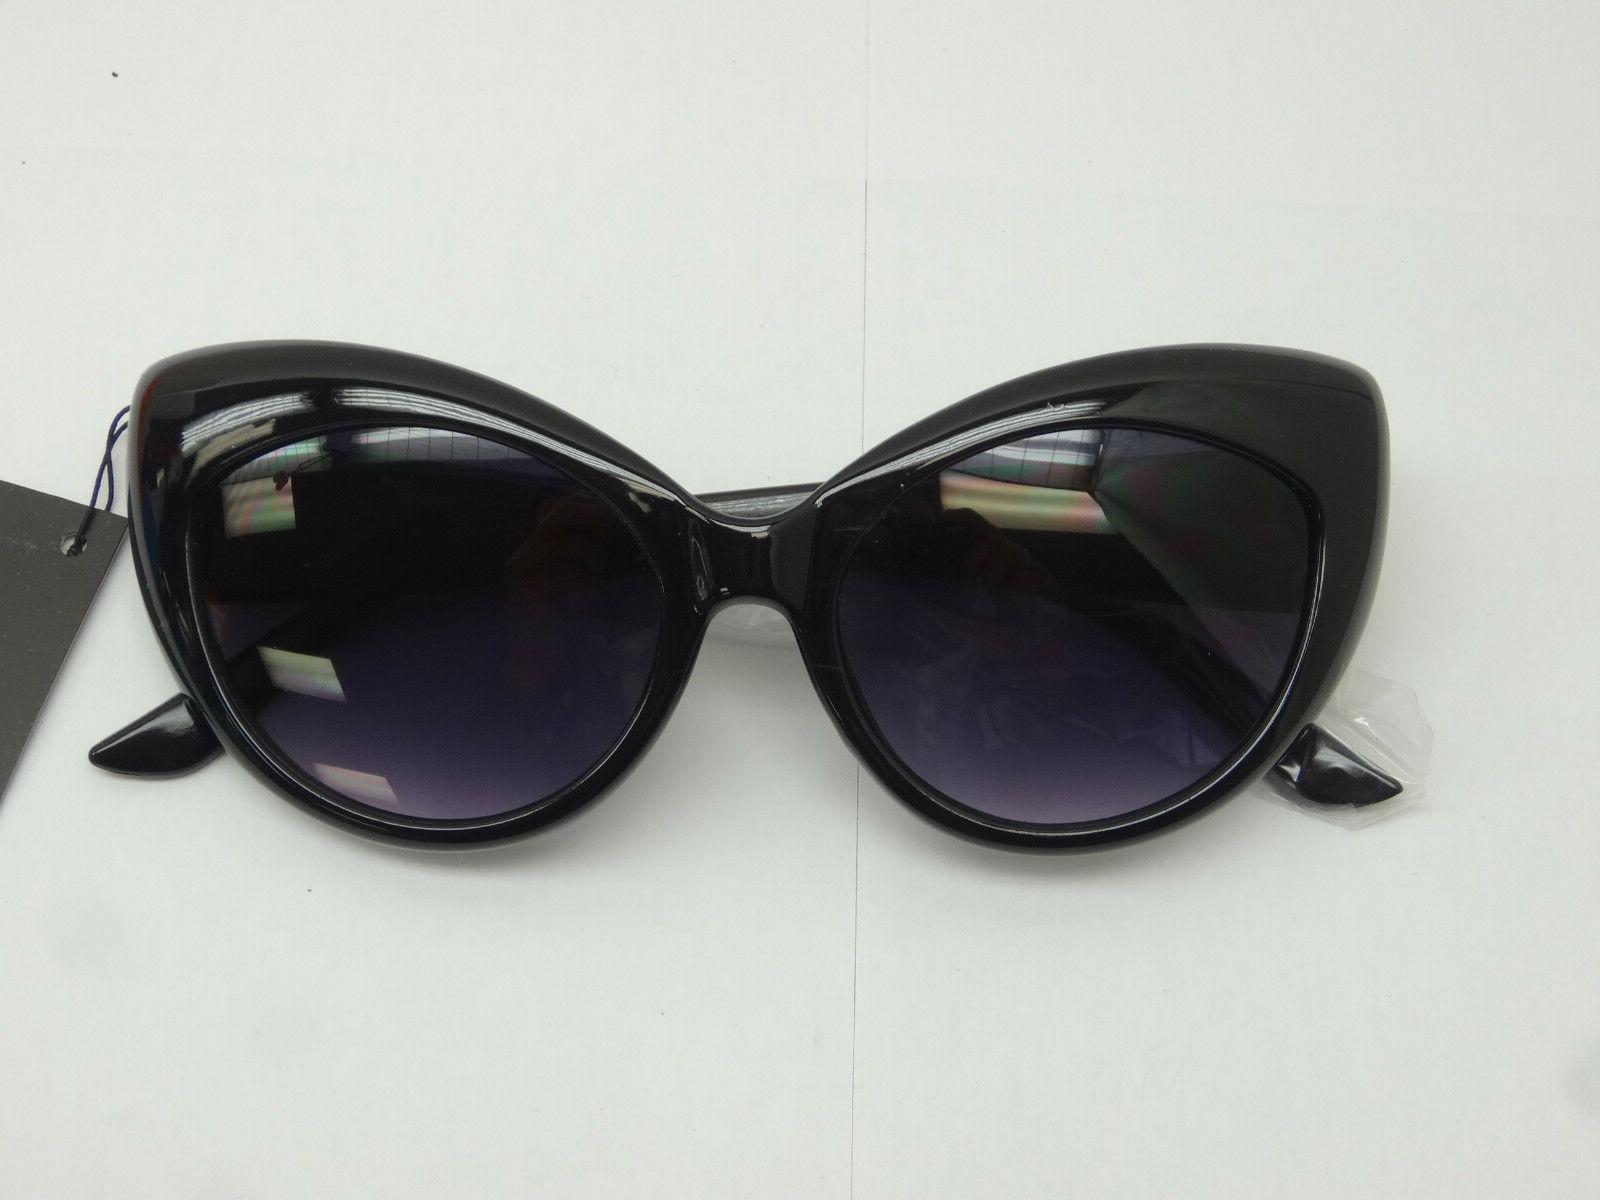 sunglasses super cateyes vintage inspired fashion mod